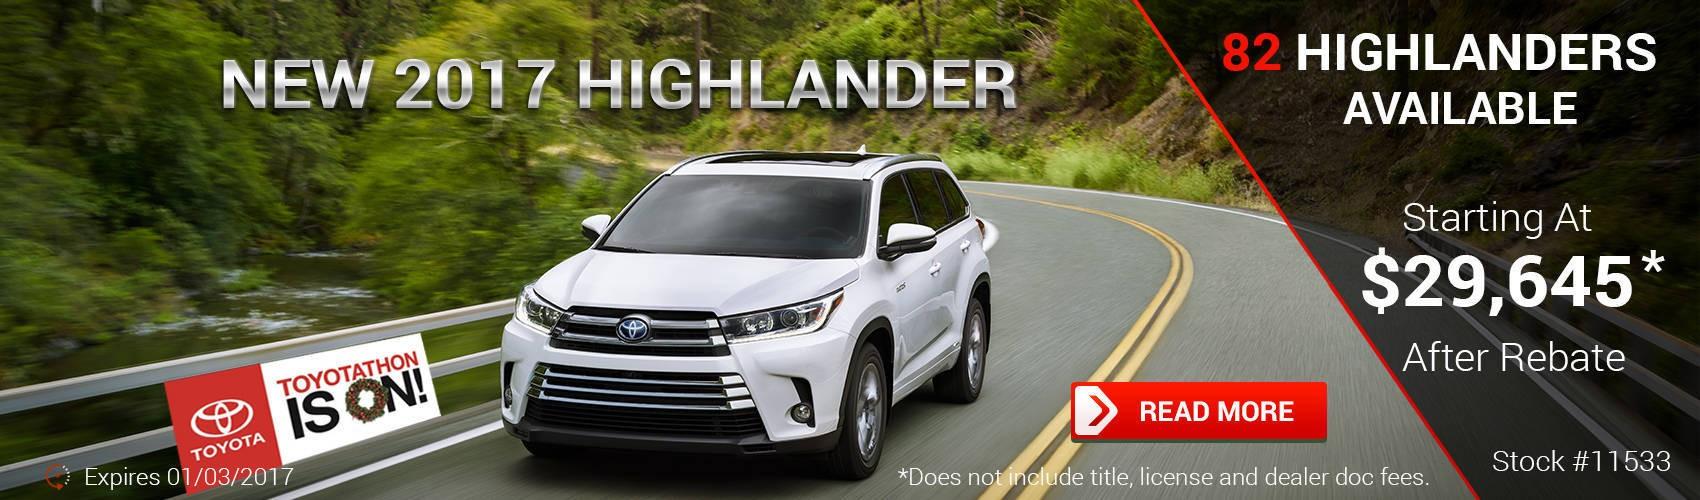 Brand New 82 highlanders available at Beaverton Toyota